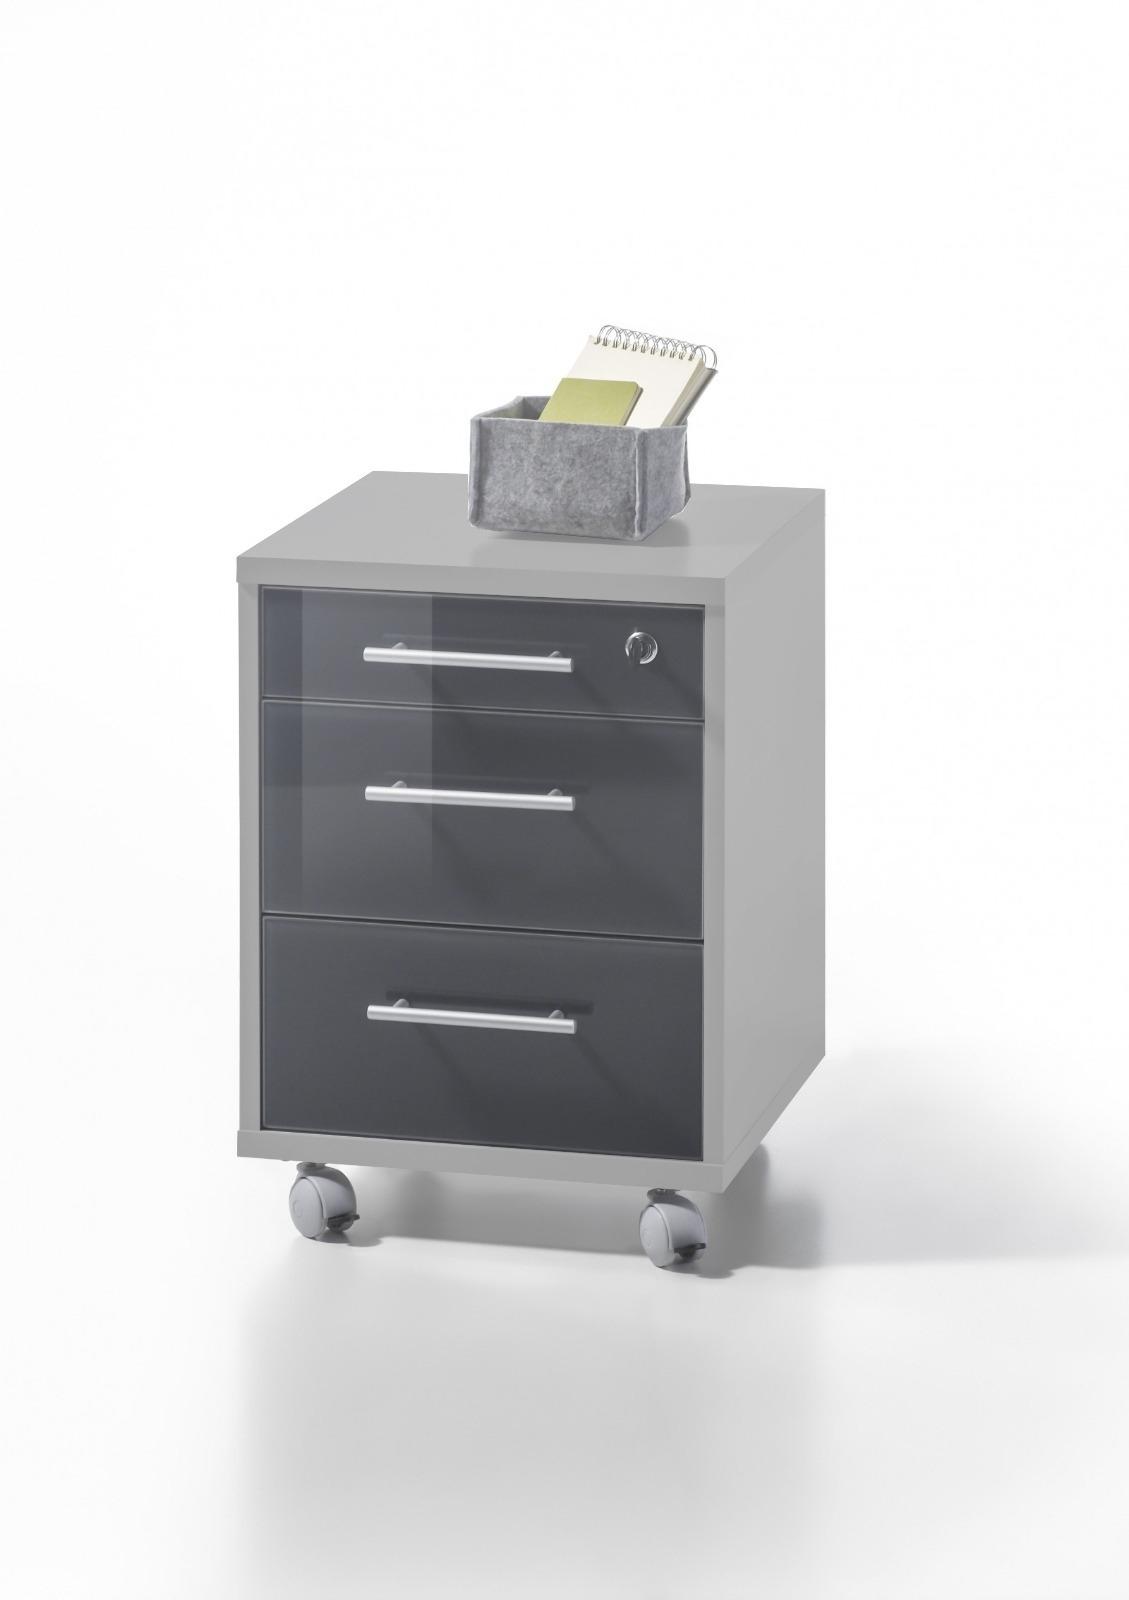 Cabinet din pal pe rotile, cu 3 sertare Luxury Gri / Grafit, l40xA40xH56 cm imagine